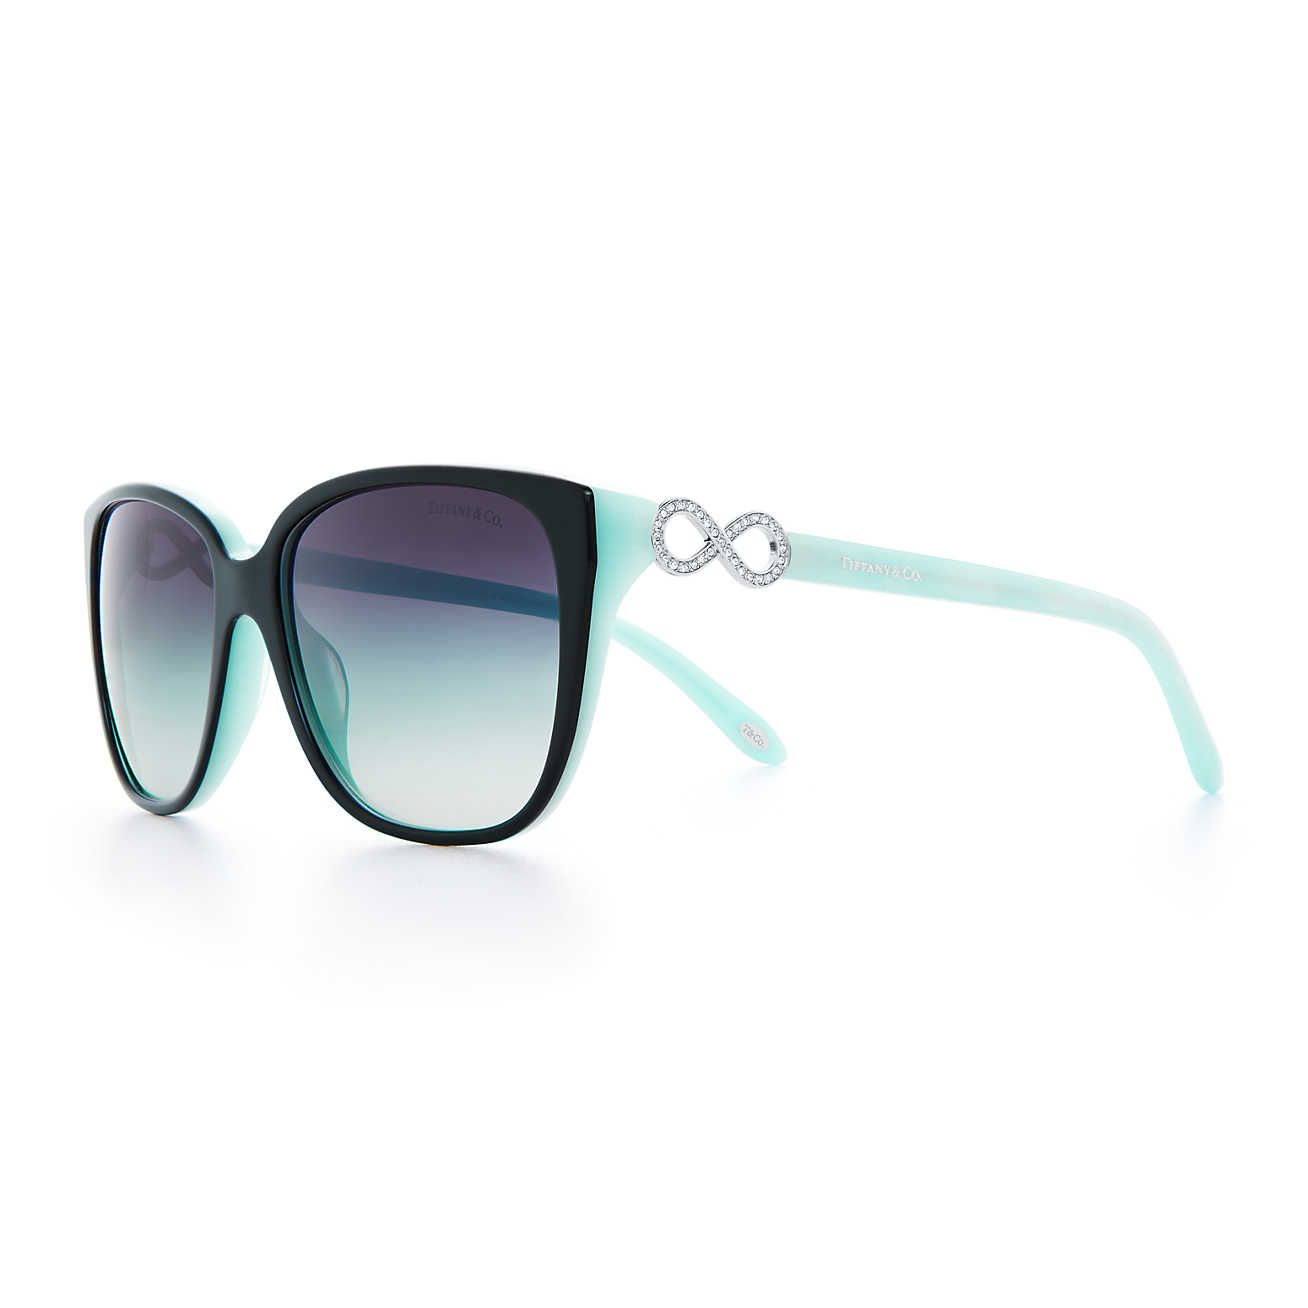 3816d7c3de Tiffany Infinity Square Sunglasses